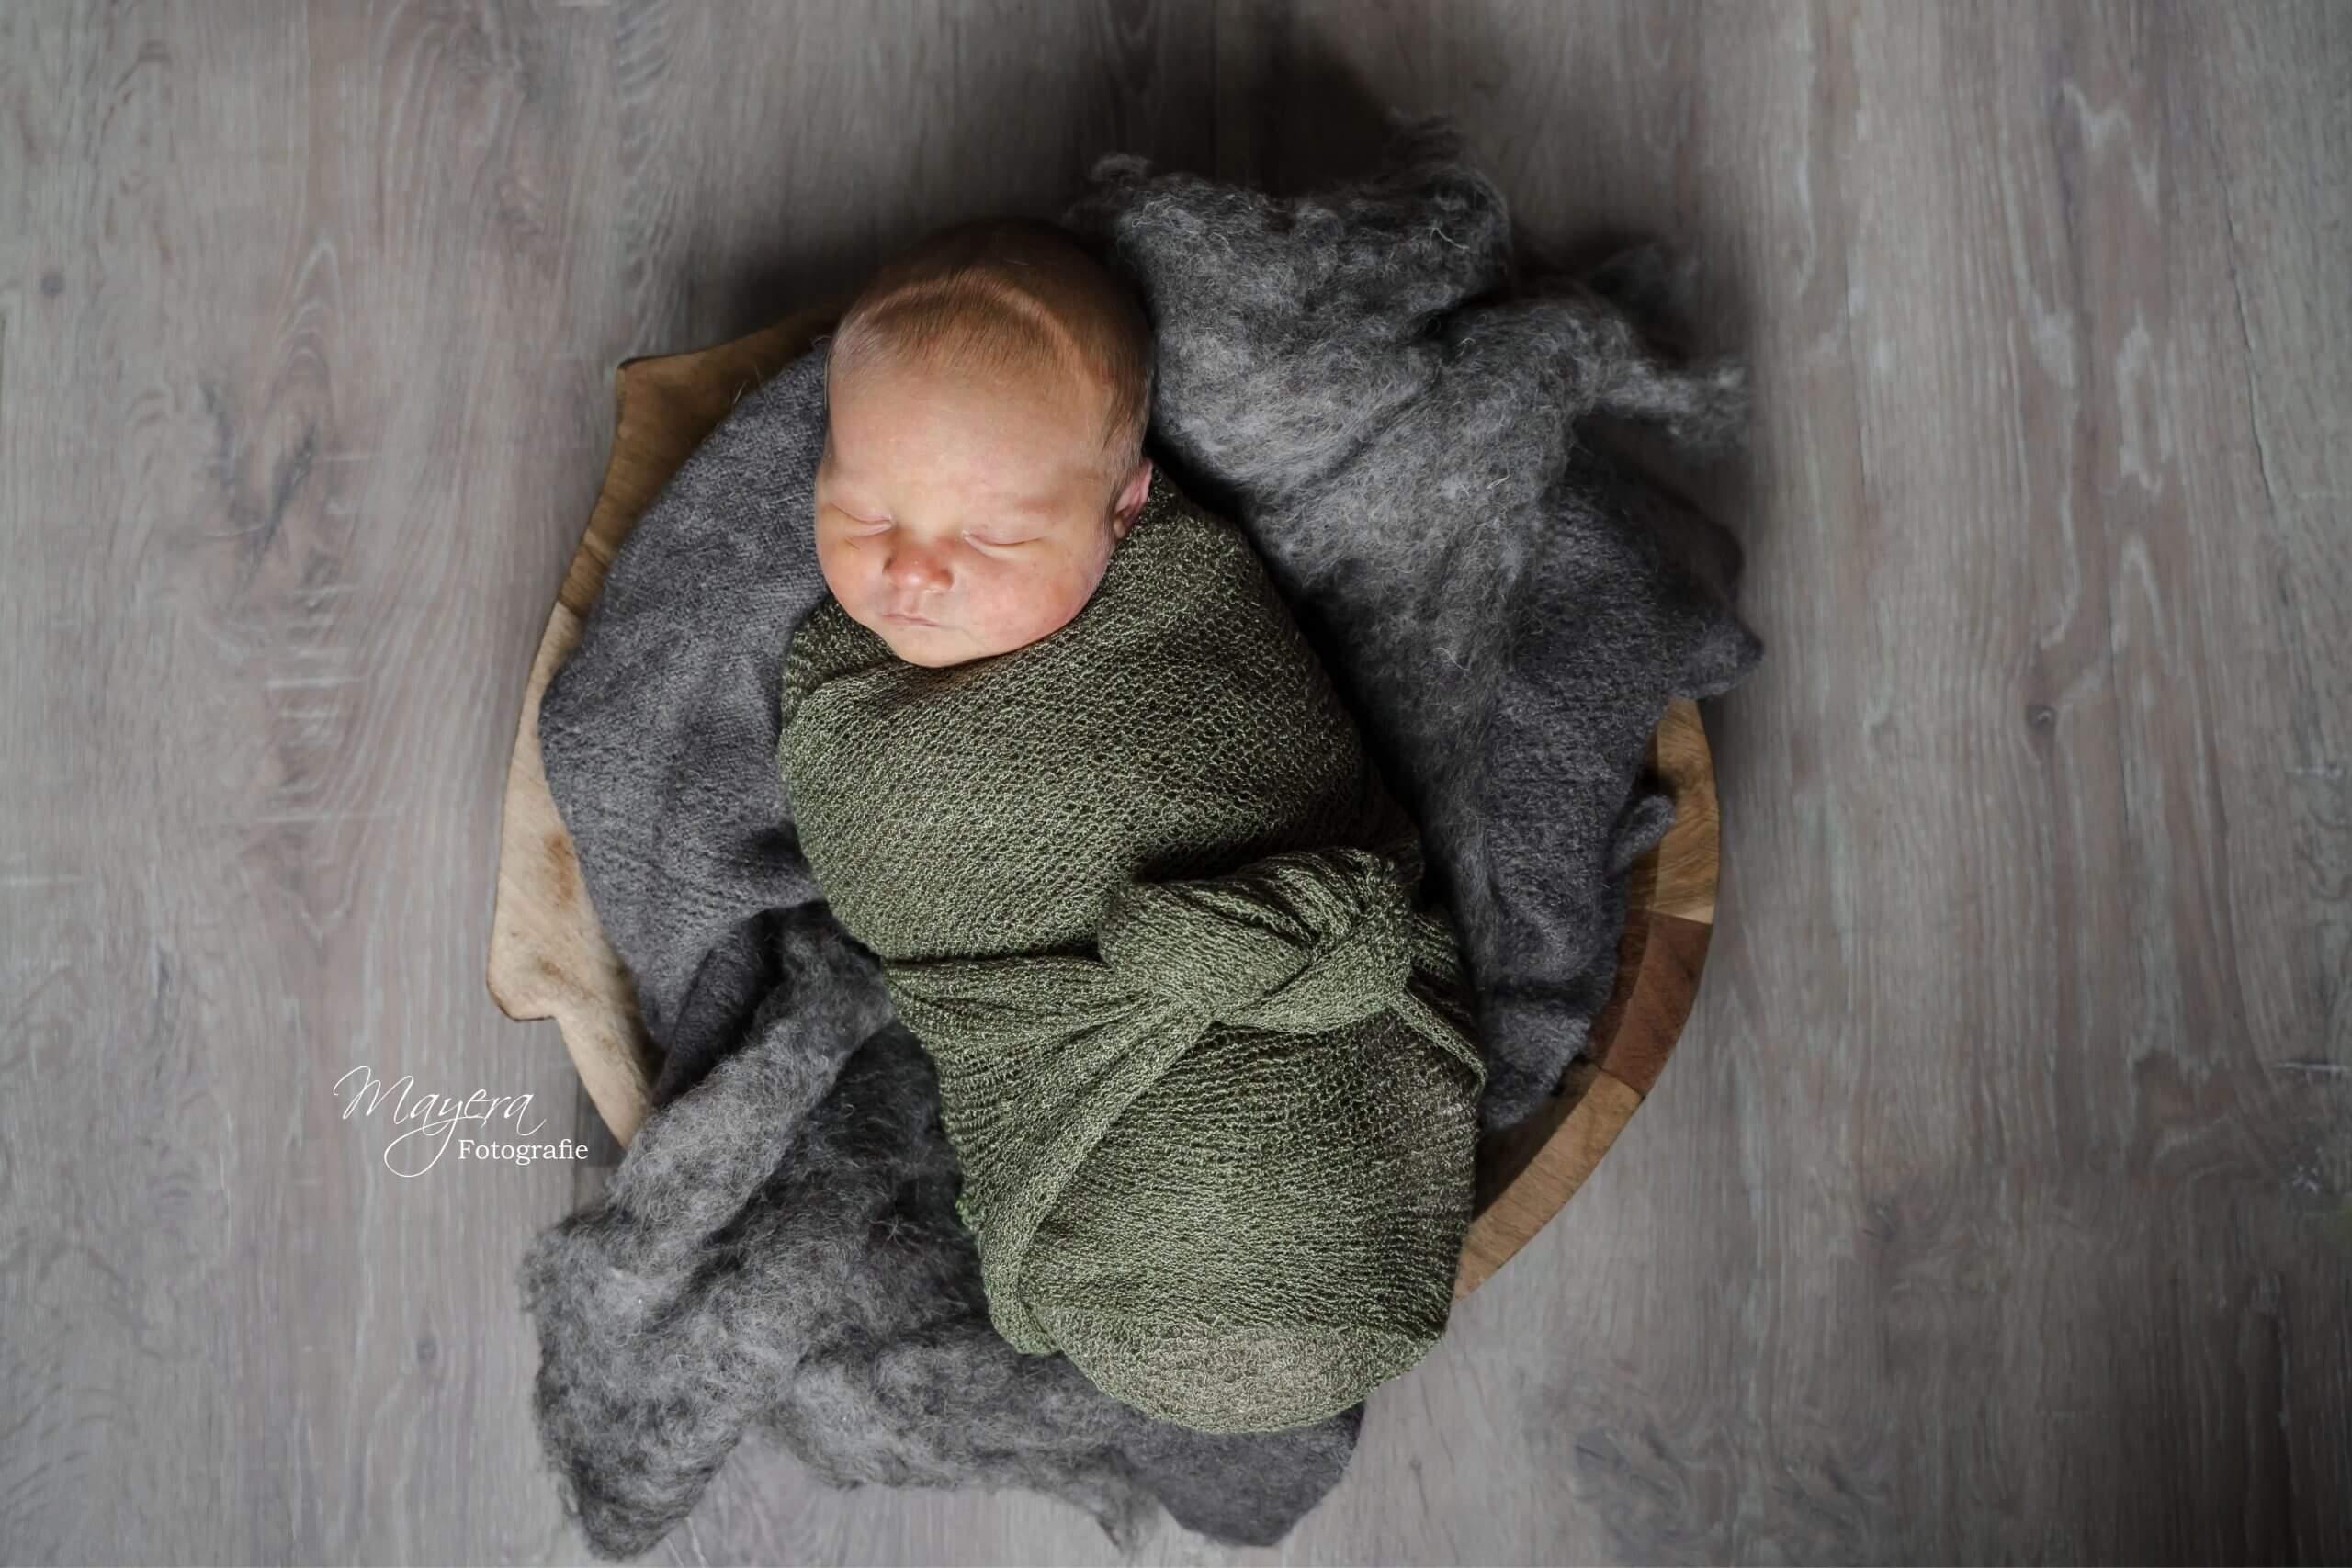 Bhodi-newborn-props-accessoires-scaled